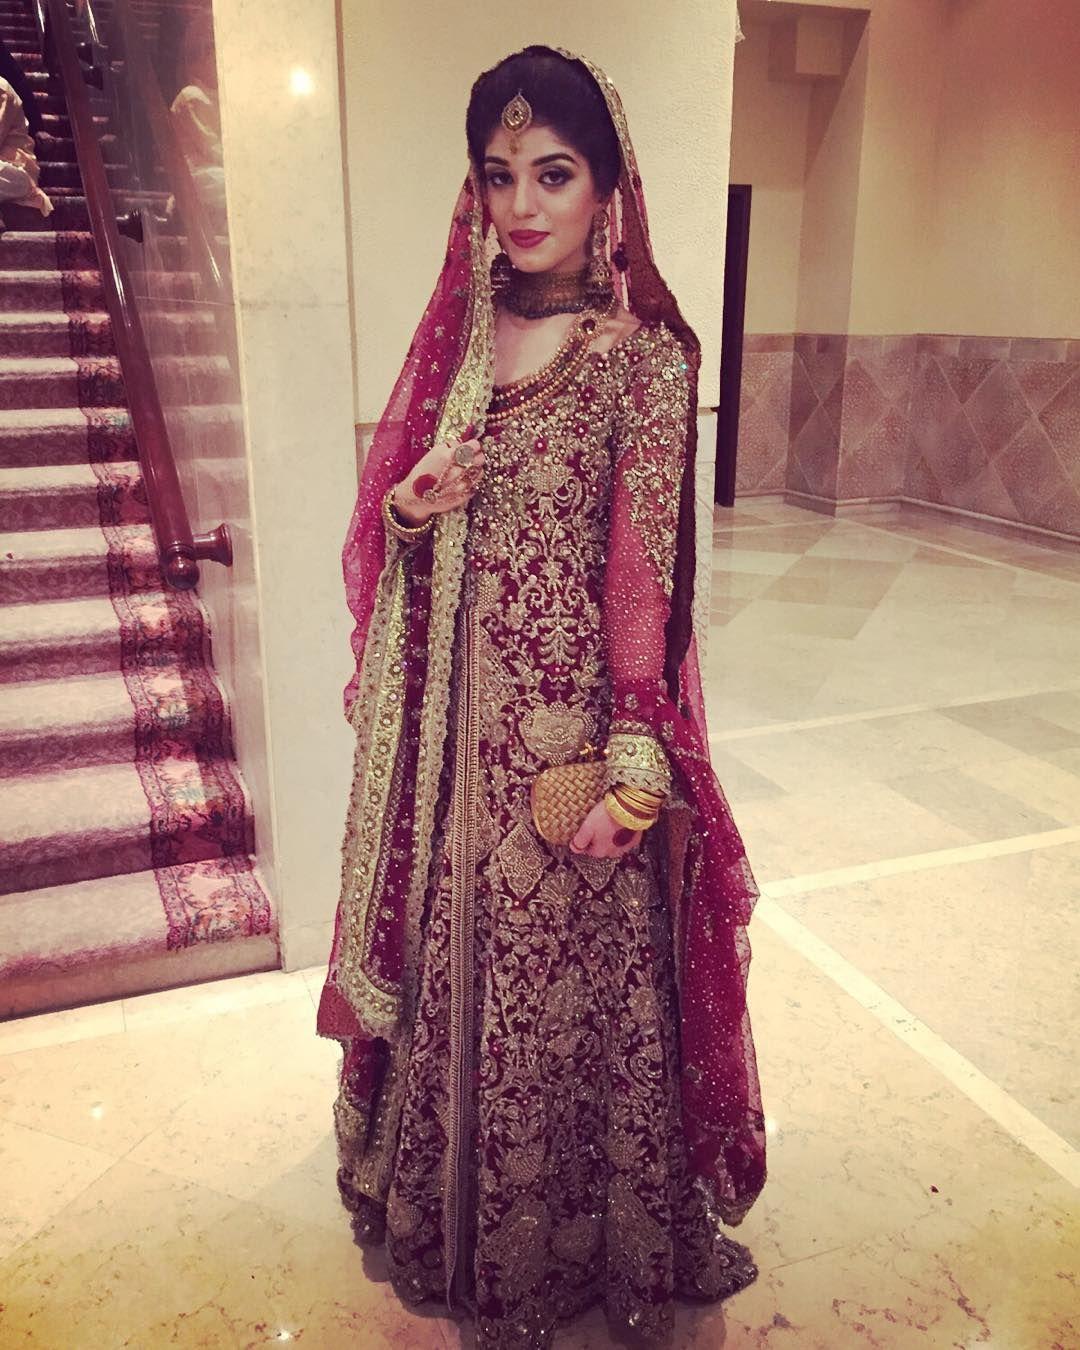 """Nada Raja makes a stunning bride in elanofficial"